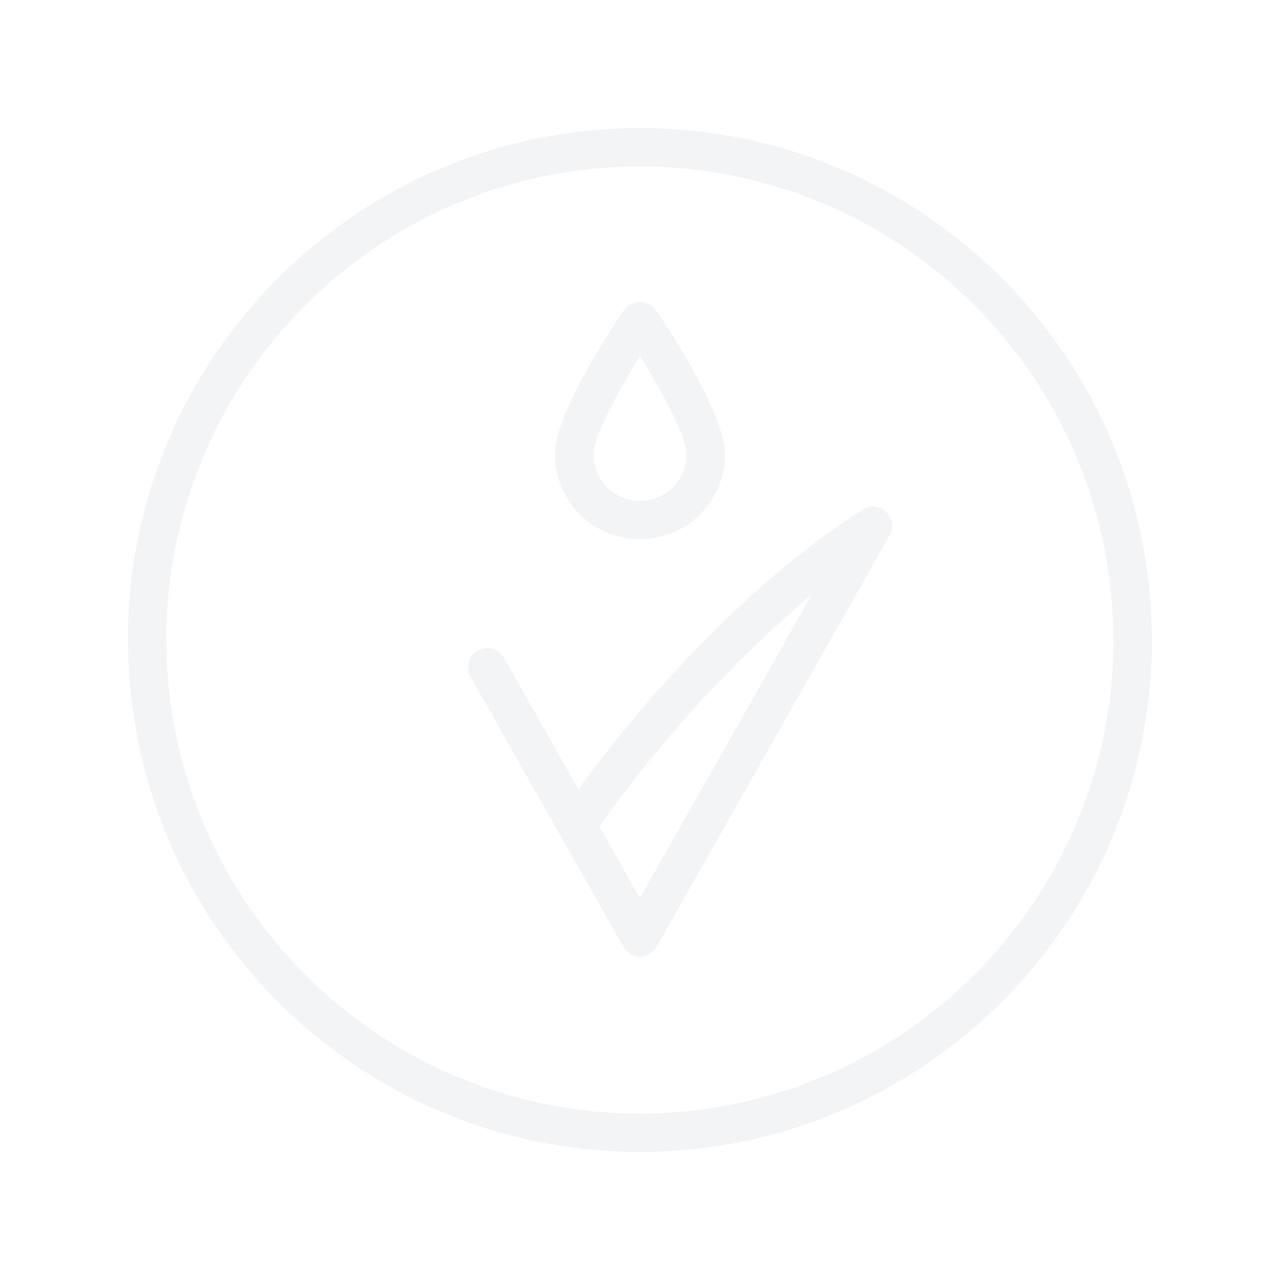 Dolce & Gabbana The One Men Deodorant Stick 75ml